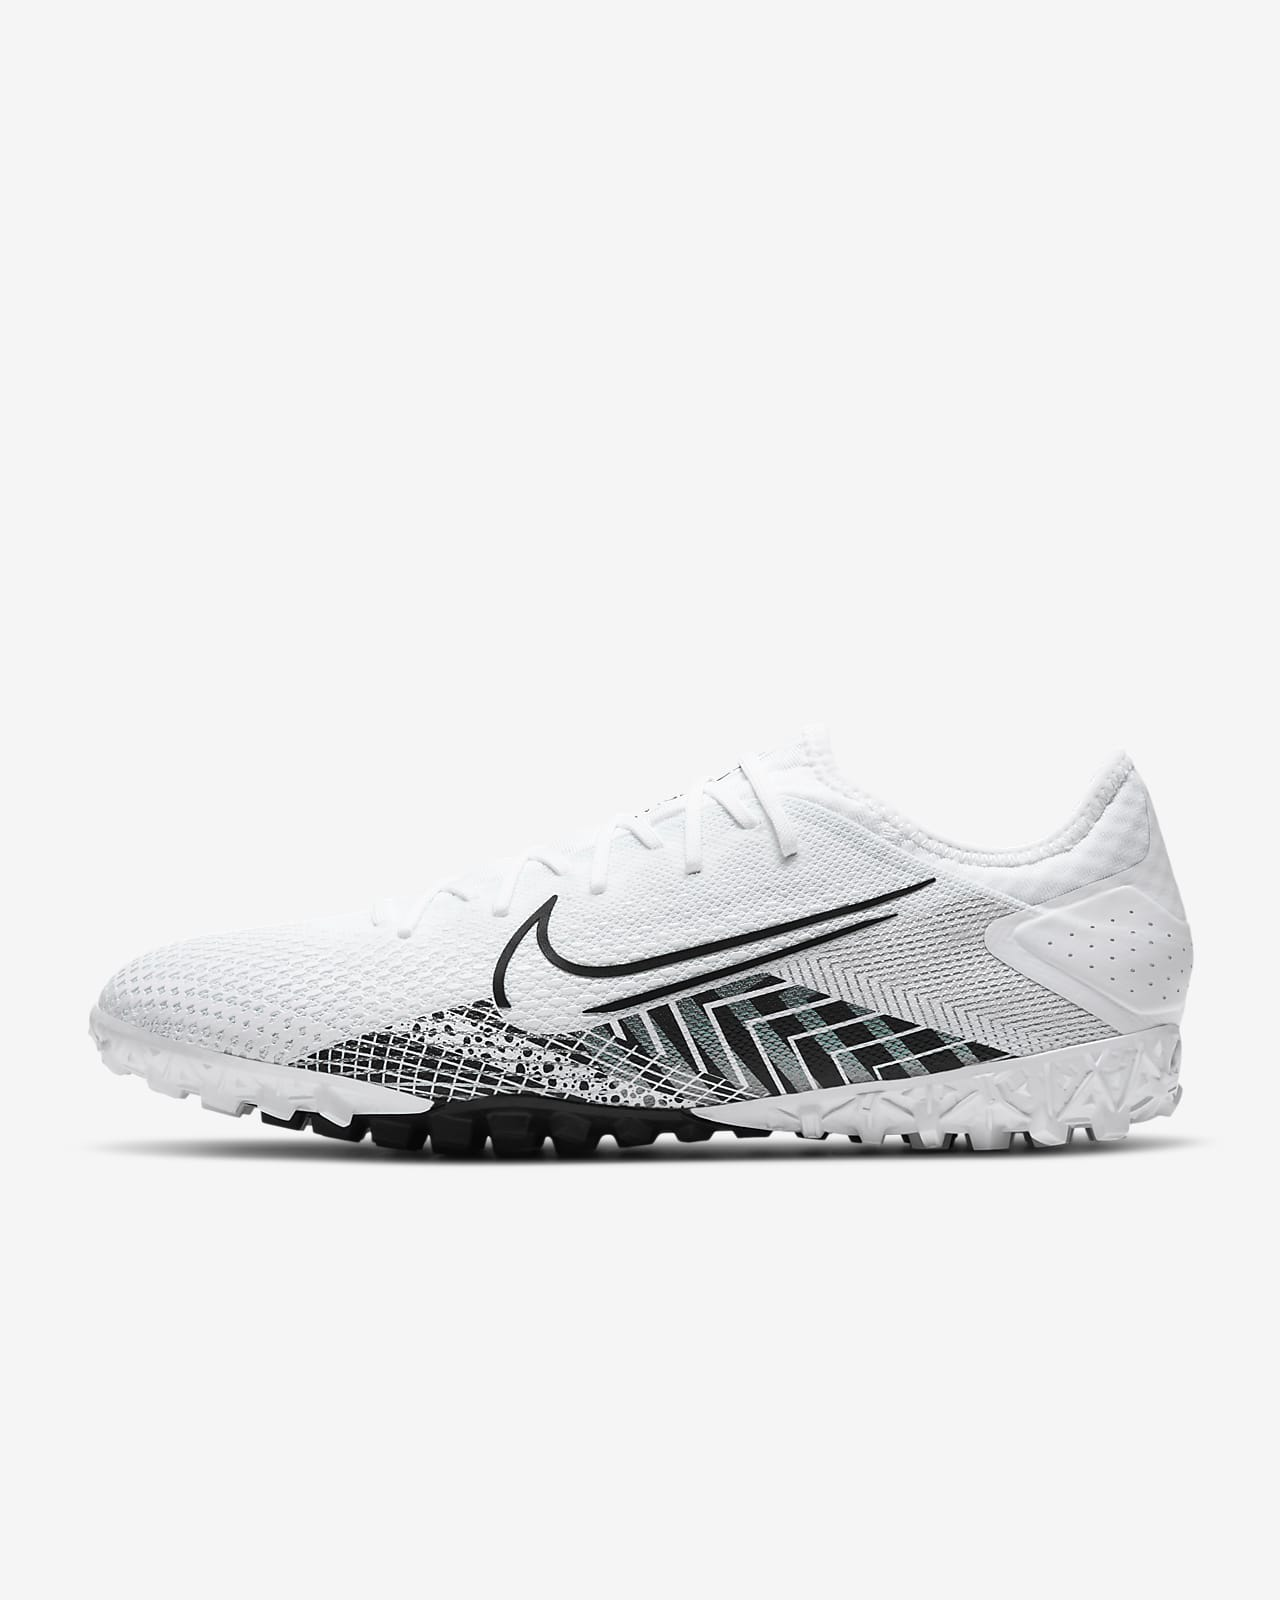 Chapoteo Currículum Cuyo  Nike Mercurial Vapor 13 Pro MDS TF Artificial-Turf Football Shoe. Nike GB